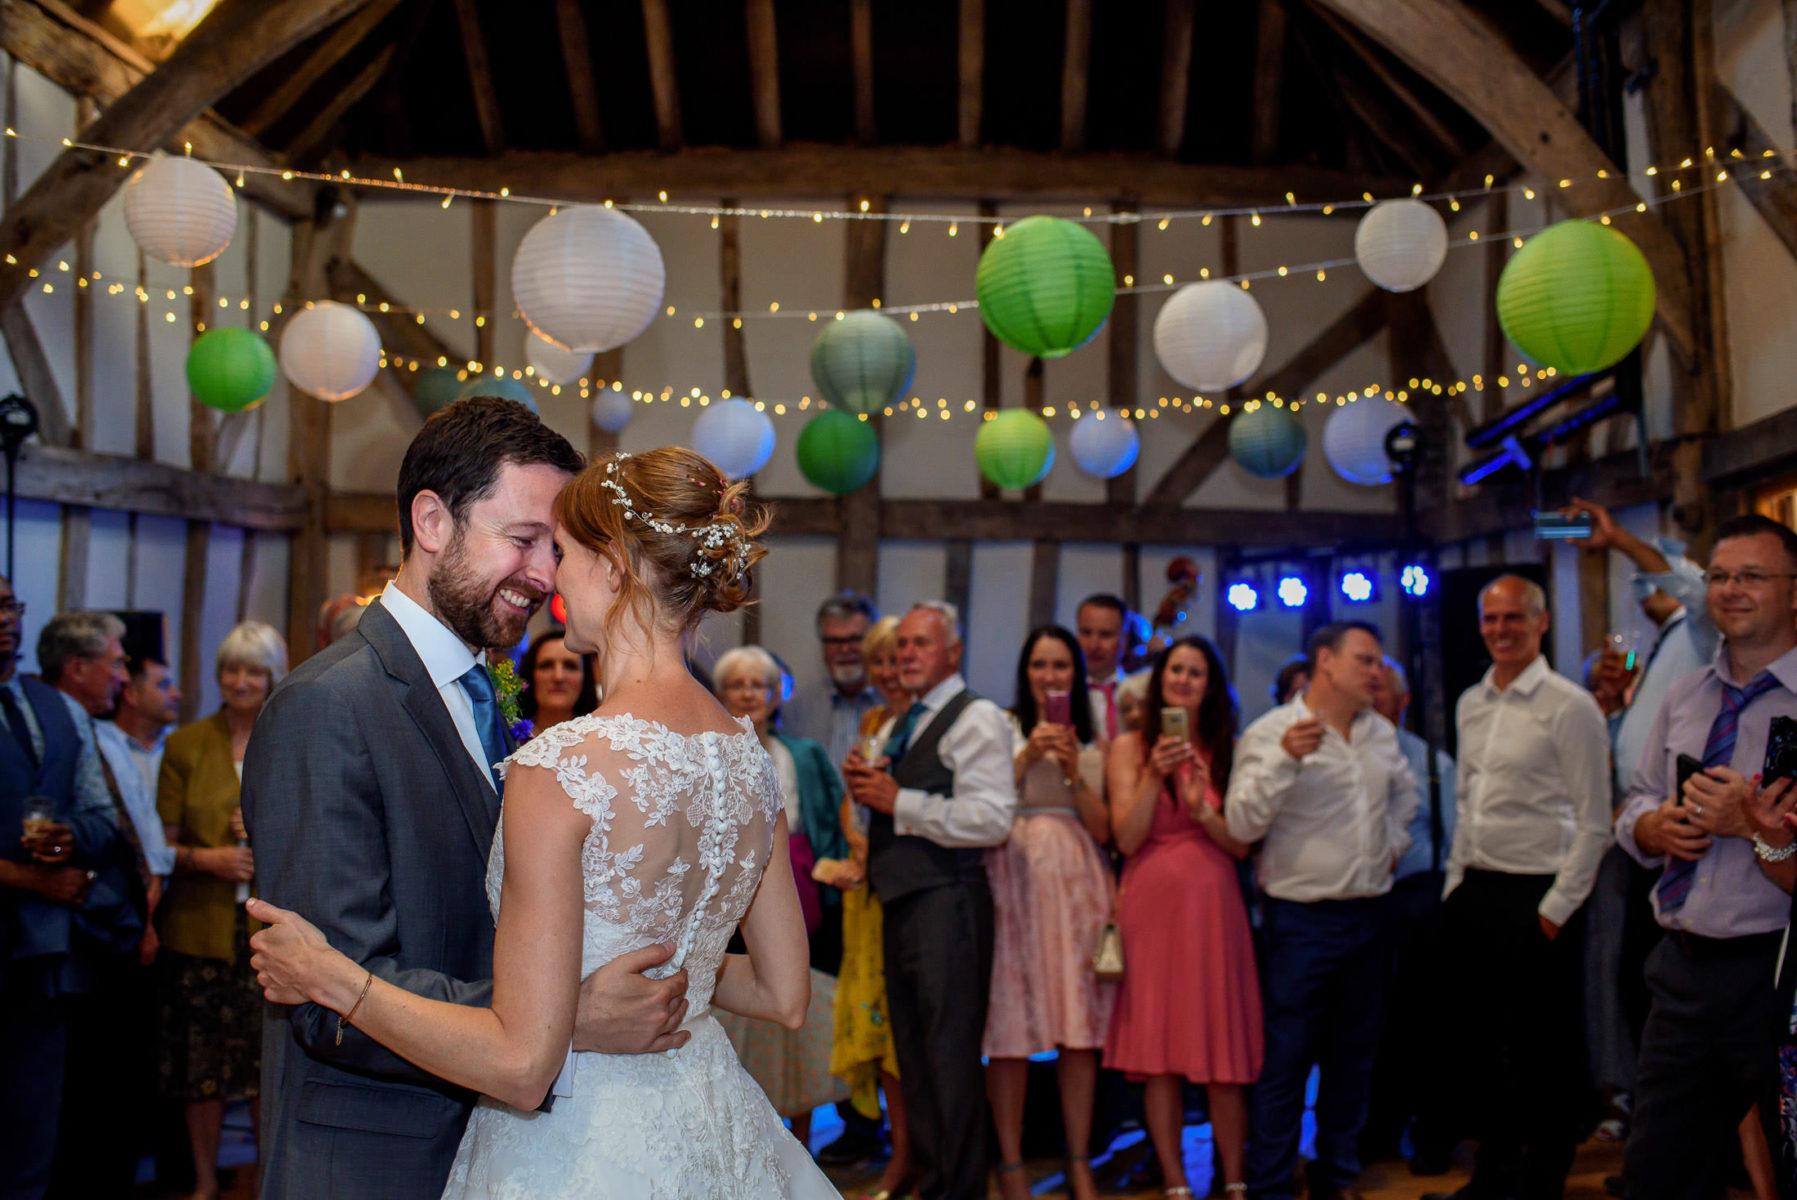 Bride and groom enjoying first dance at Patricks Barn